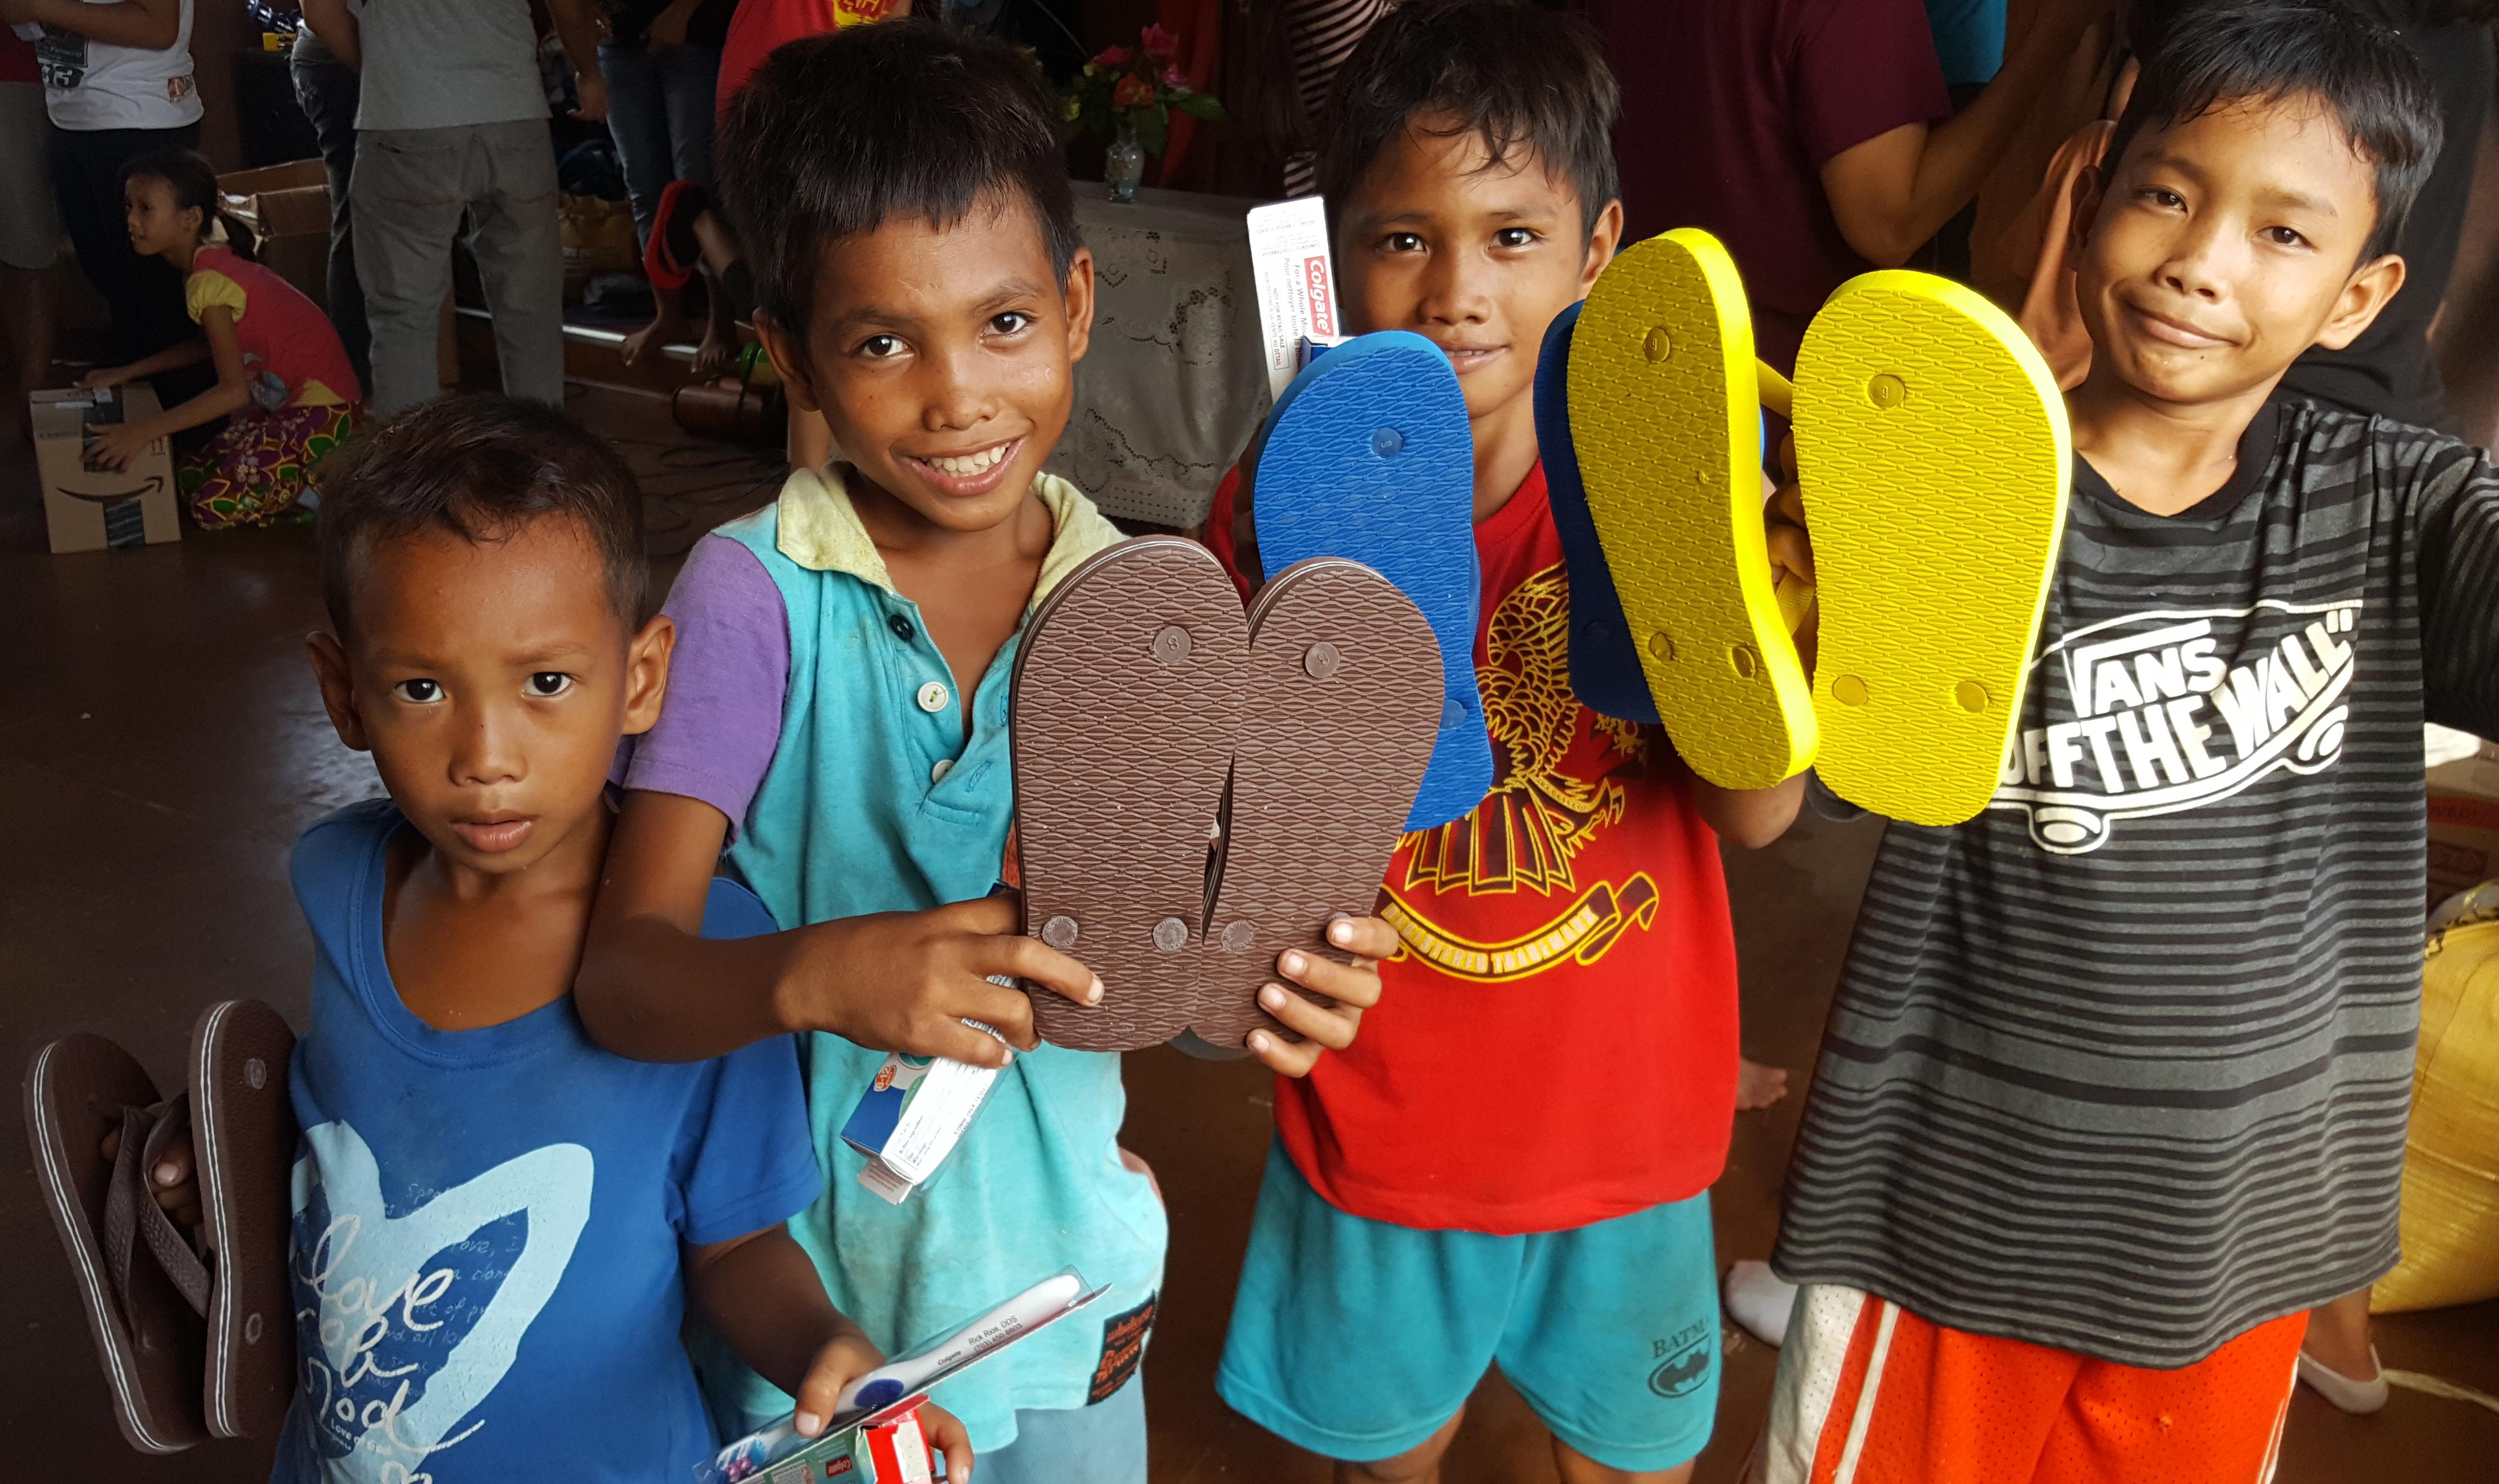 Flip flop distribution by IVCF Visayas to Badjao Community in Cebu, Philippines